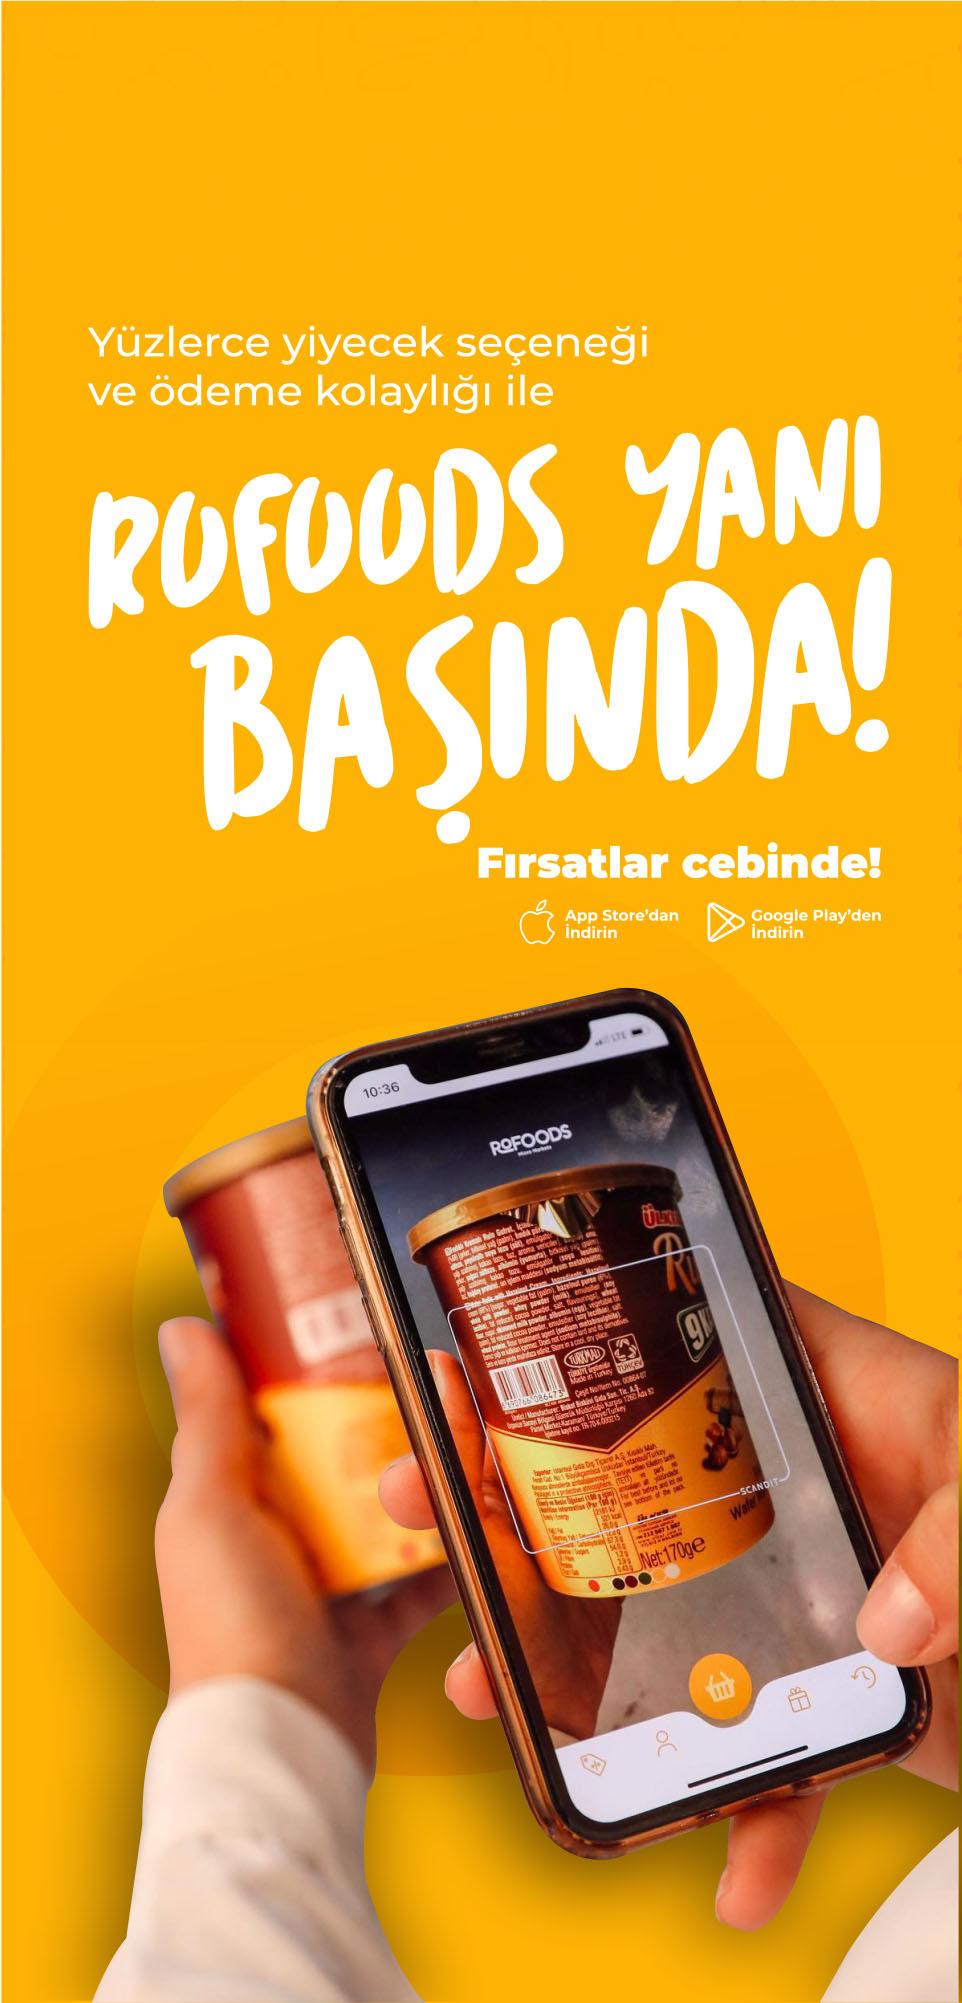 Anasayfa (Yeni).cdr